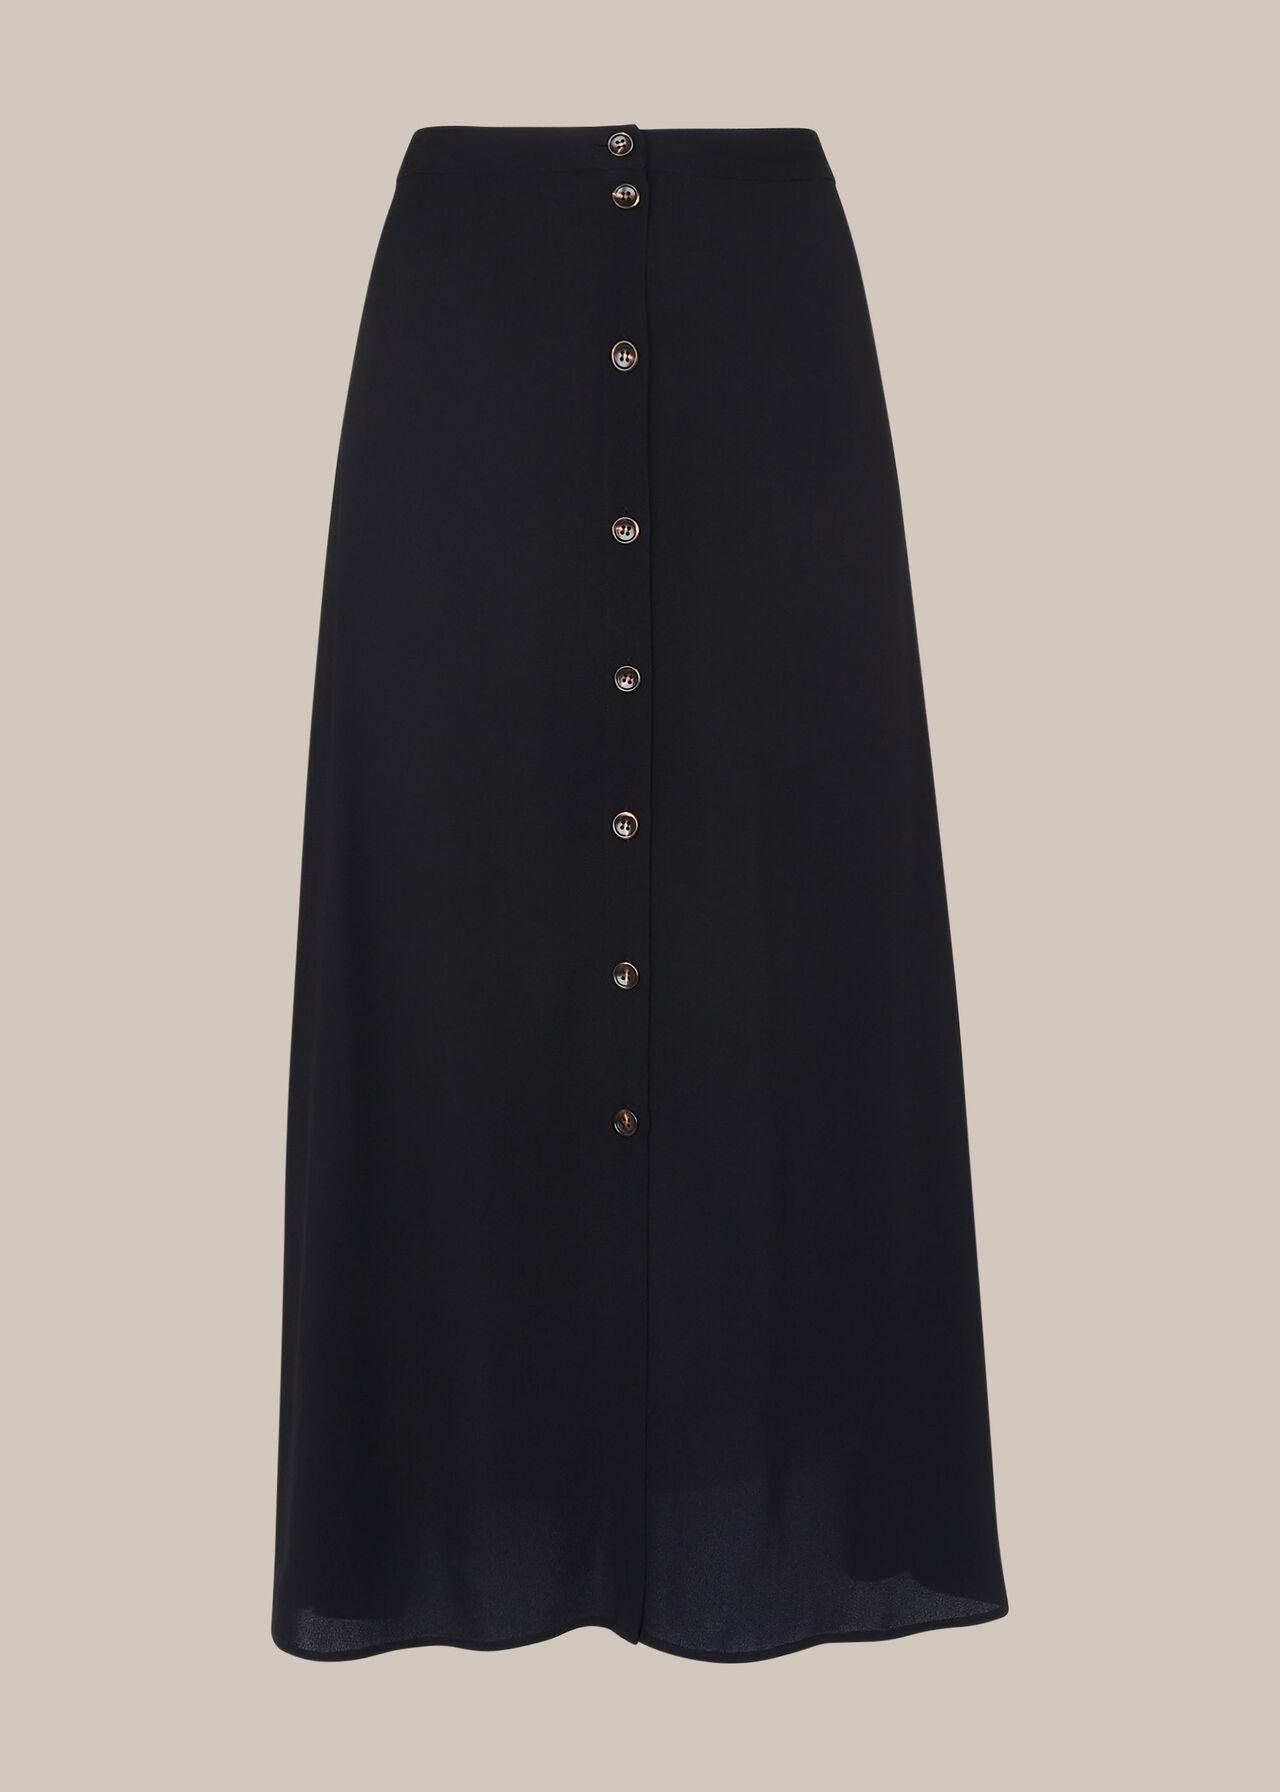 Button Front Skirt